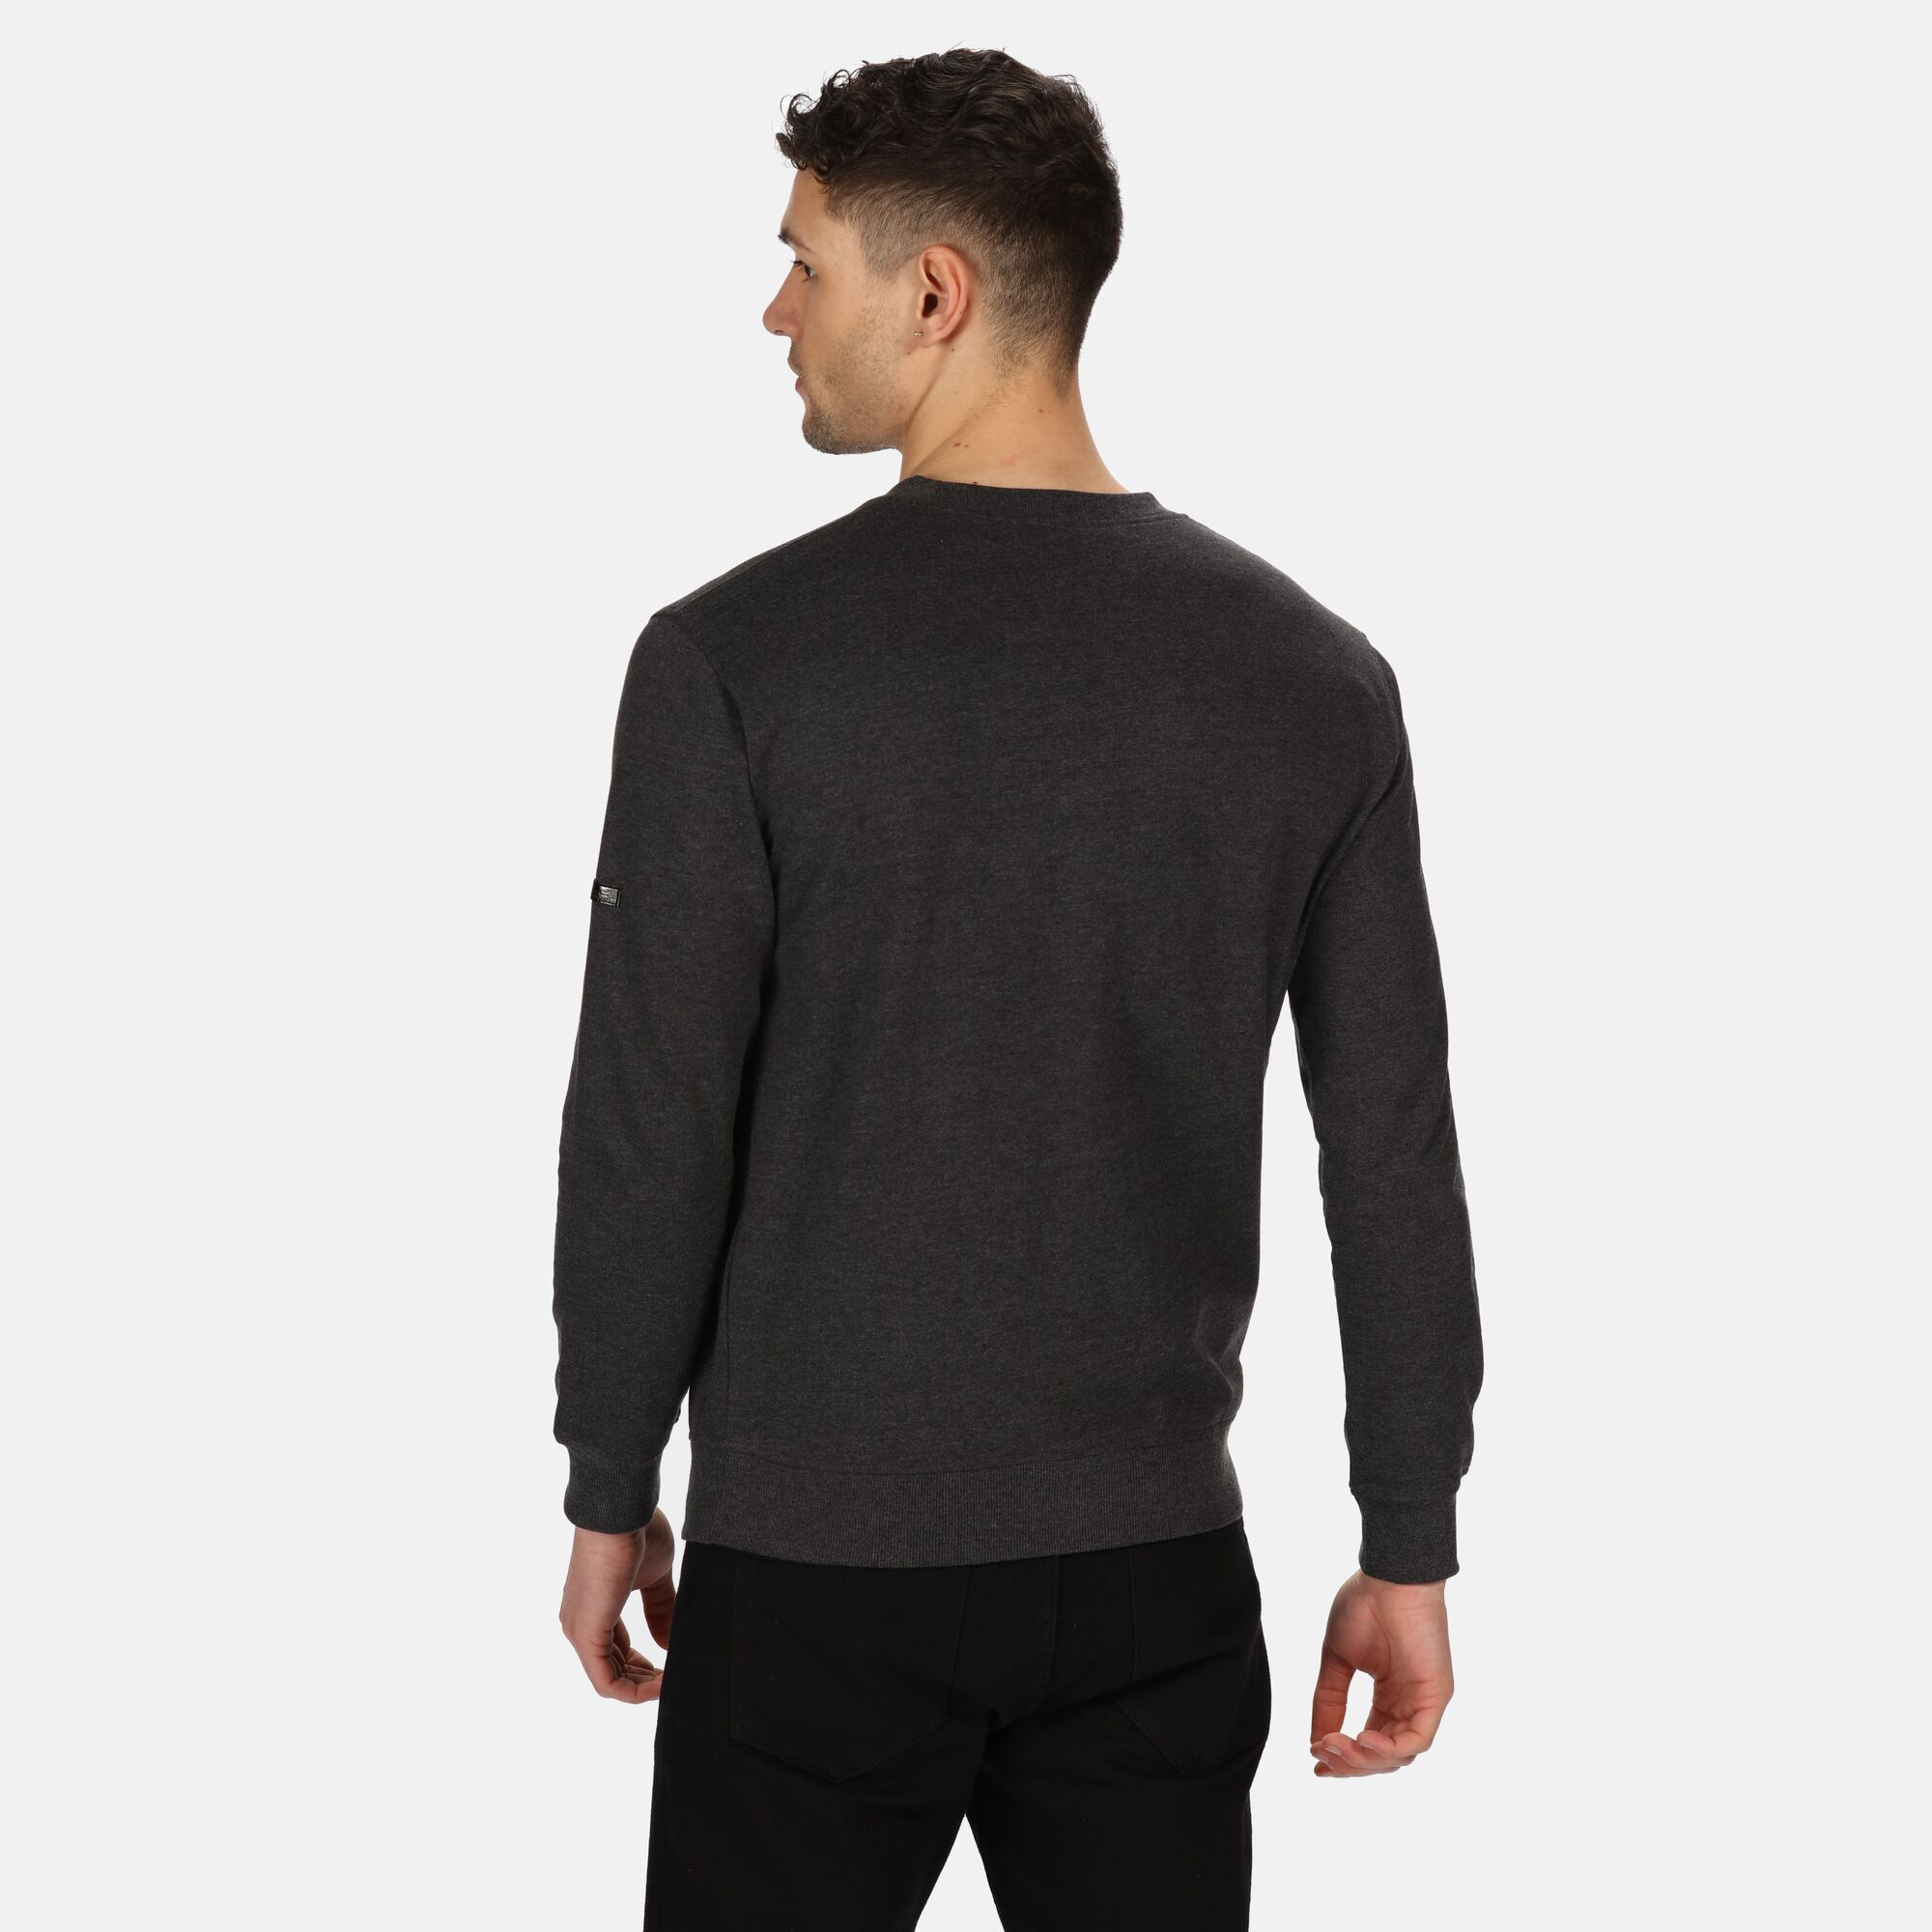 Regatta Payson Mens Fleece Sweatshirt